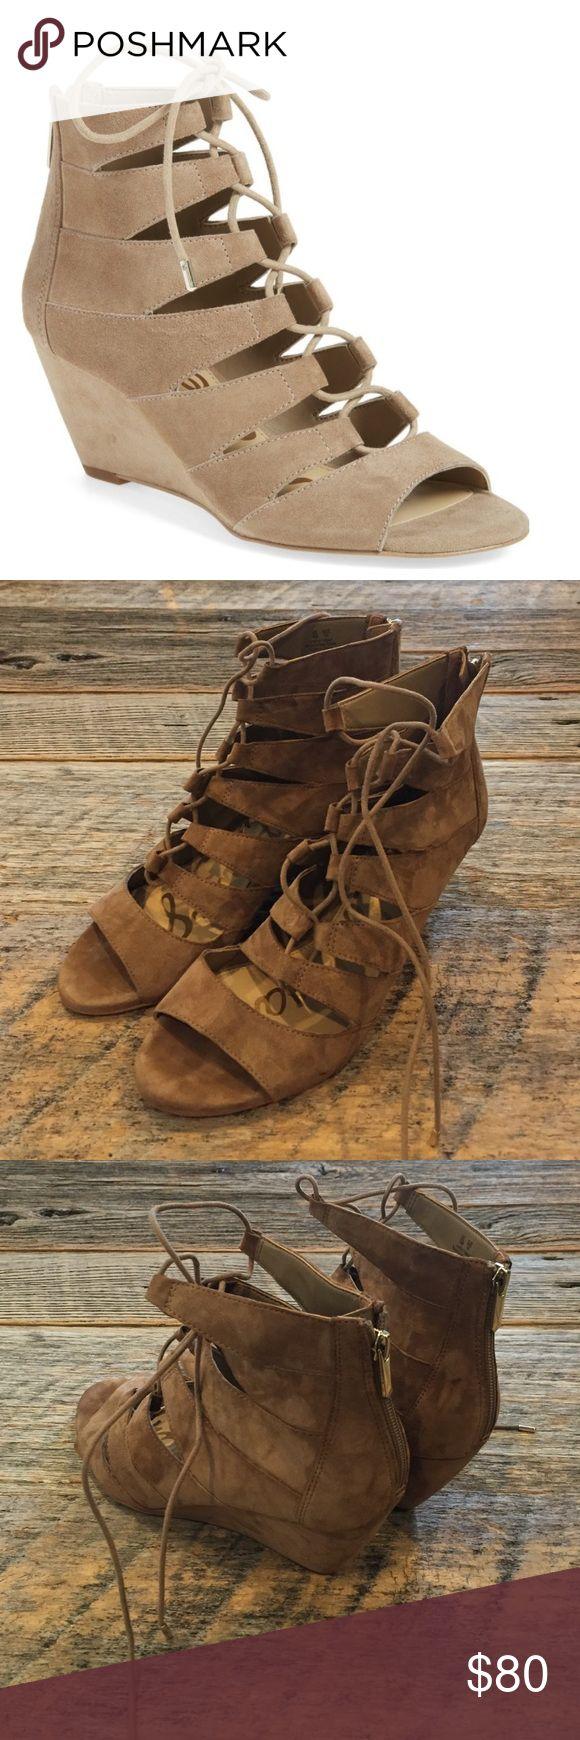 Sam Edelman Santina Lace Up Wedge sandals EUC, hardly worn. Oatmeal suede lace up wedge sandals. No box or trades. Sam Edelman Shoes Sandals